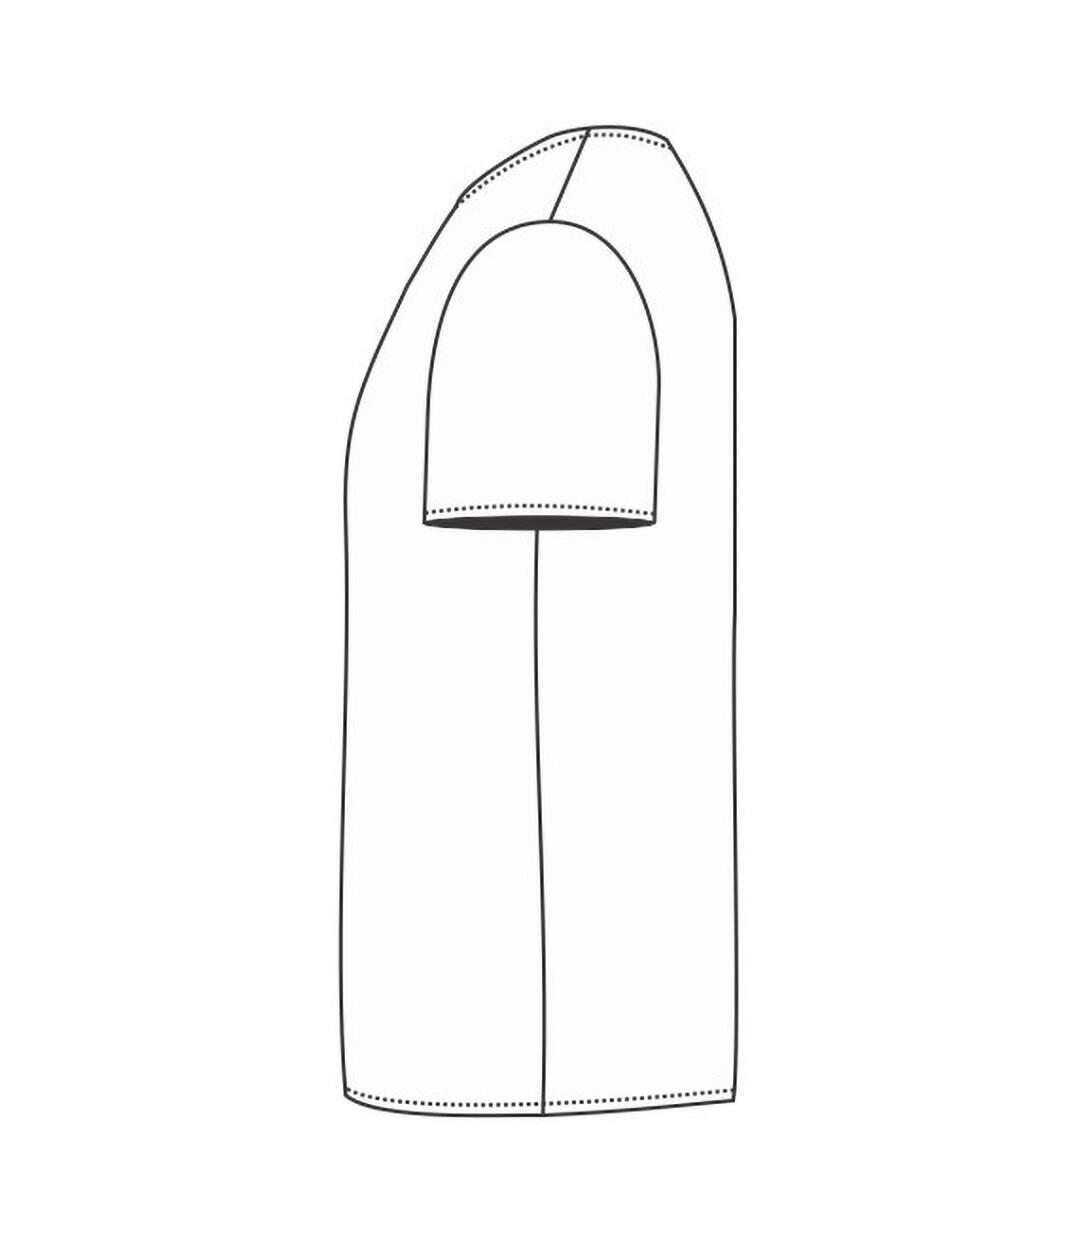 B&C Mens Exact V-Neck Short Sleeve T-Shirt (White) - UTBC1289